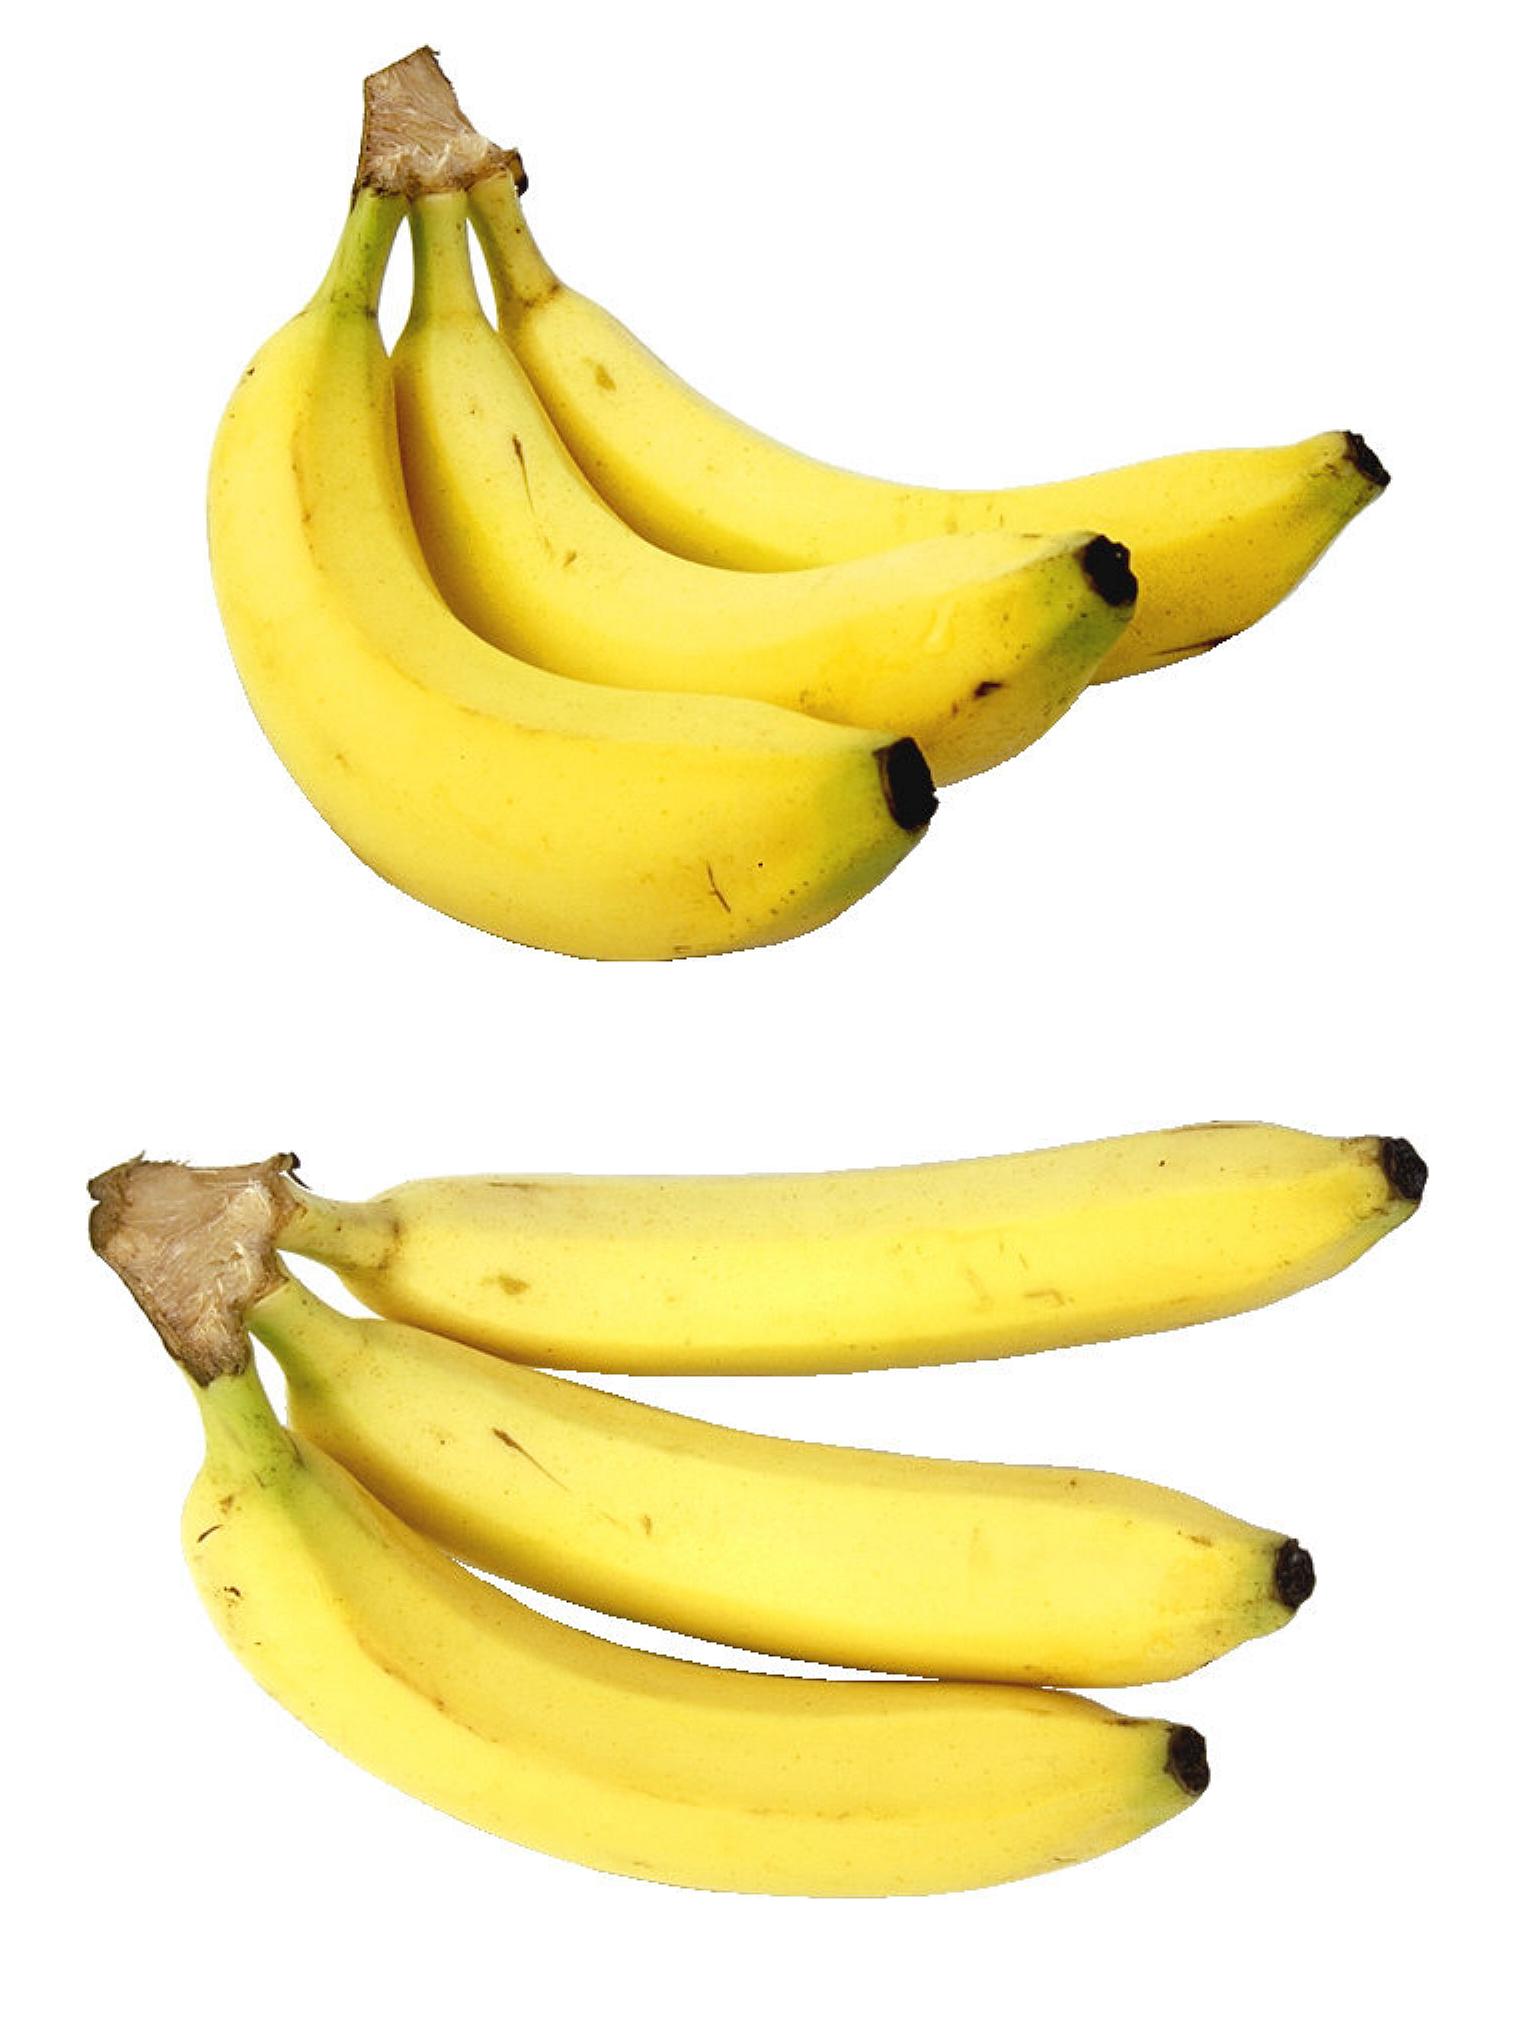 Fresh bananas photo